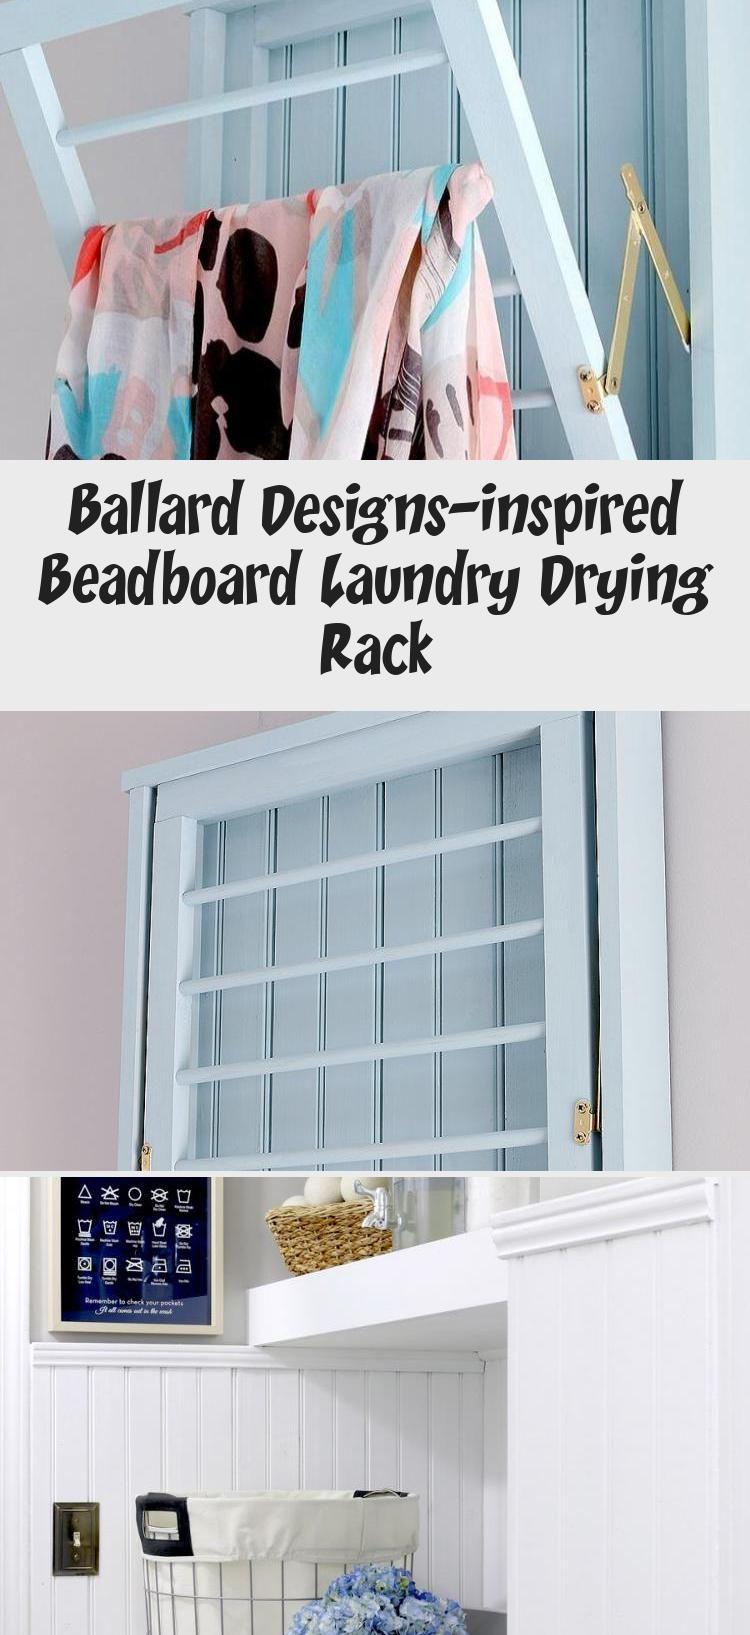 Ballard Designs Inspired Beadboard Laundry Drying Rack In 2020